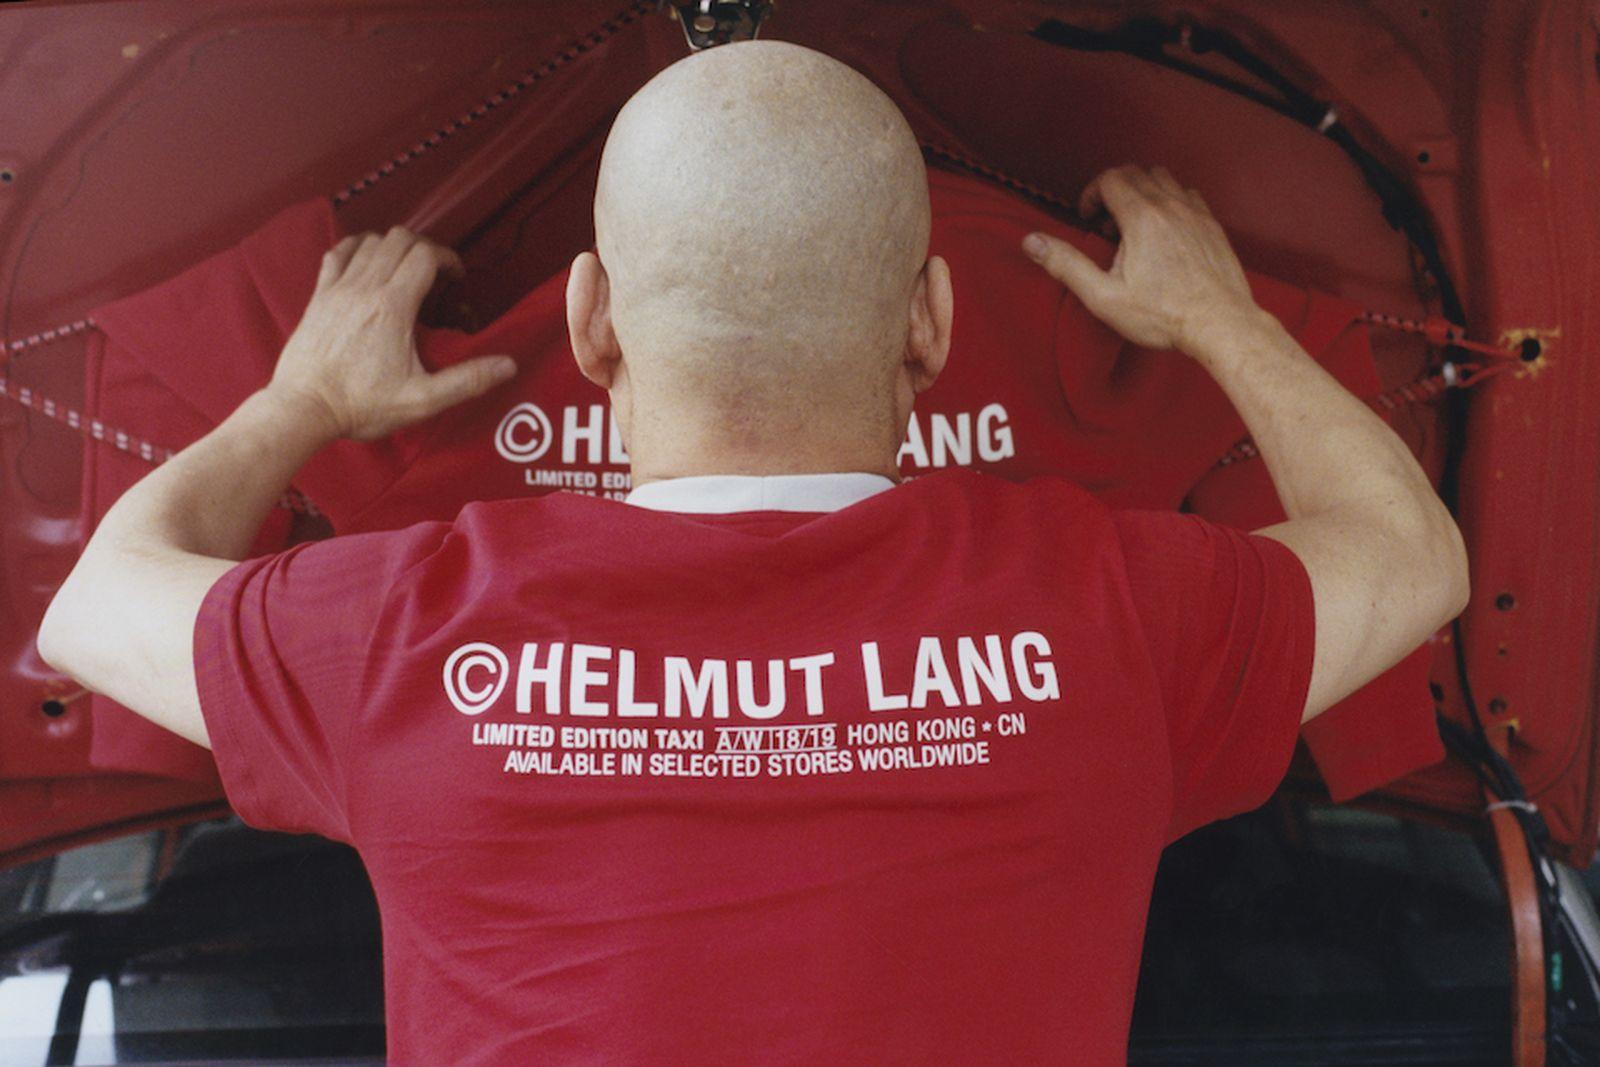 helmut-lang-global-taxi-ss18-capsule-03